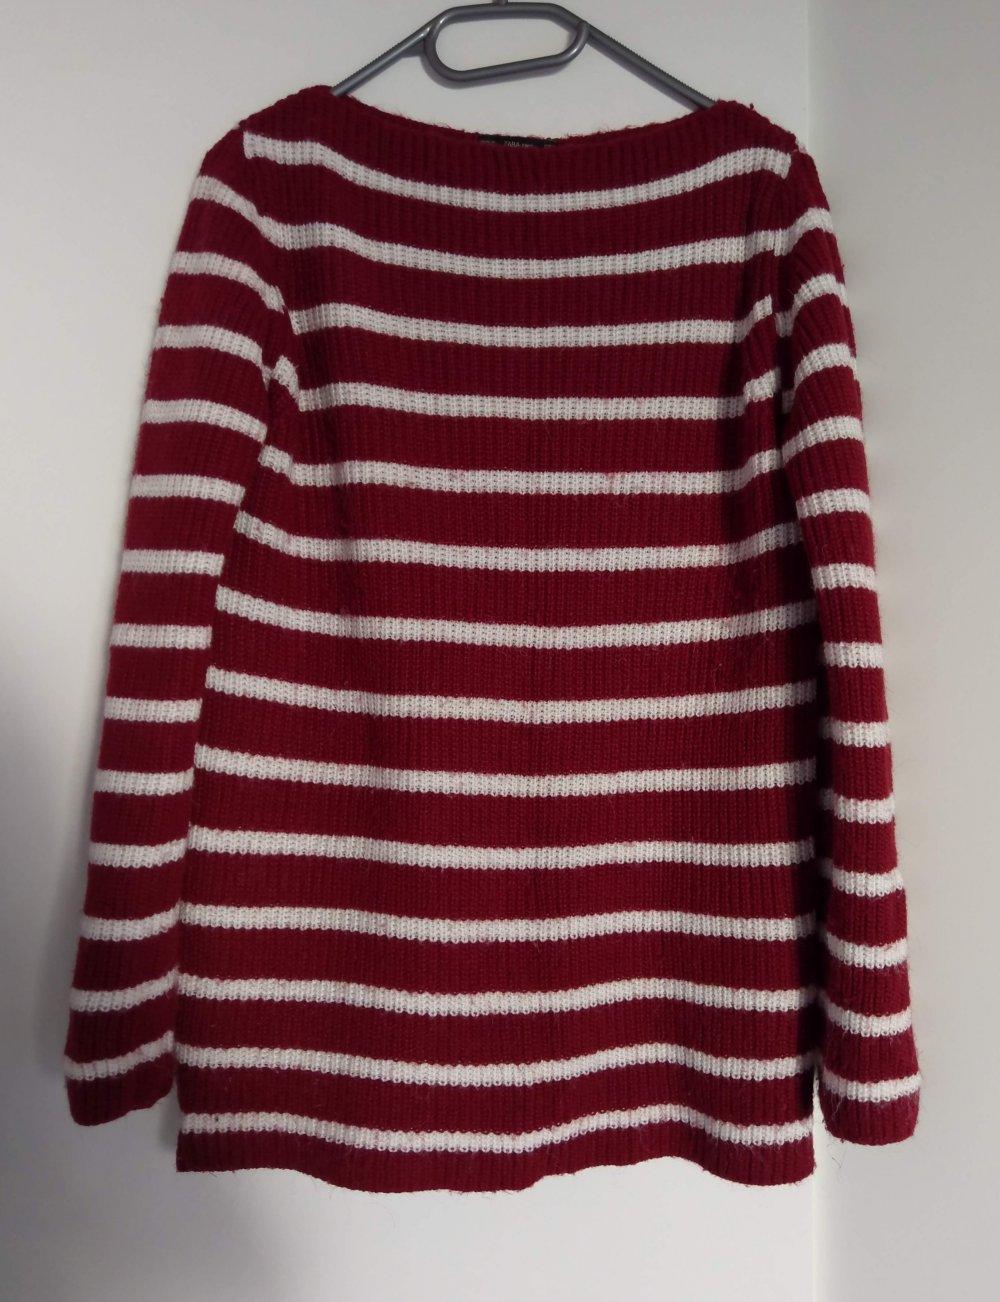 c506ad20754c7f Zara KNIT Pullover rot weiß gestreift Zara KNIT Pullover rot weiß gestreift  ...